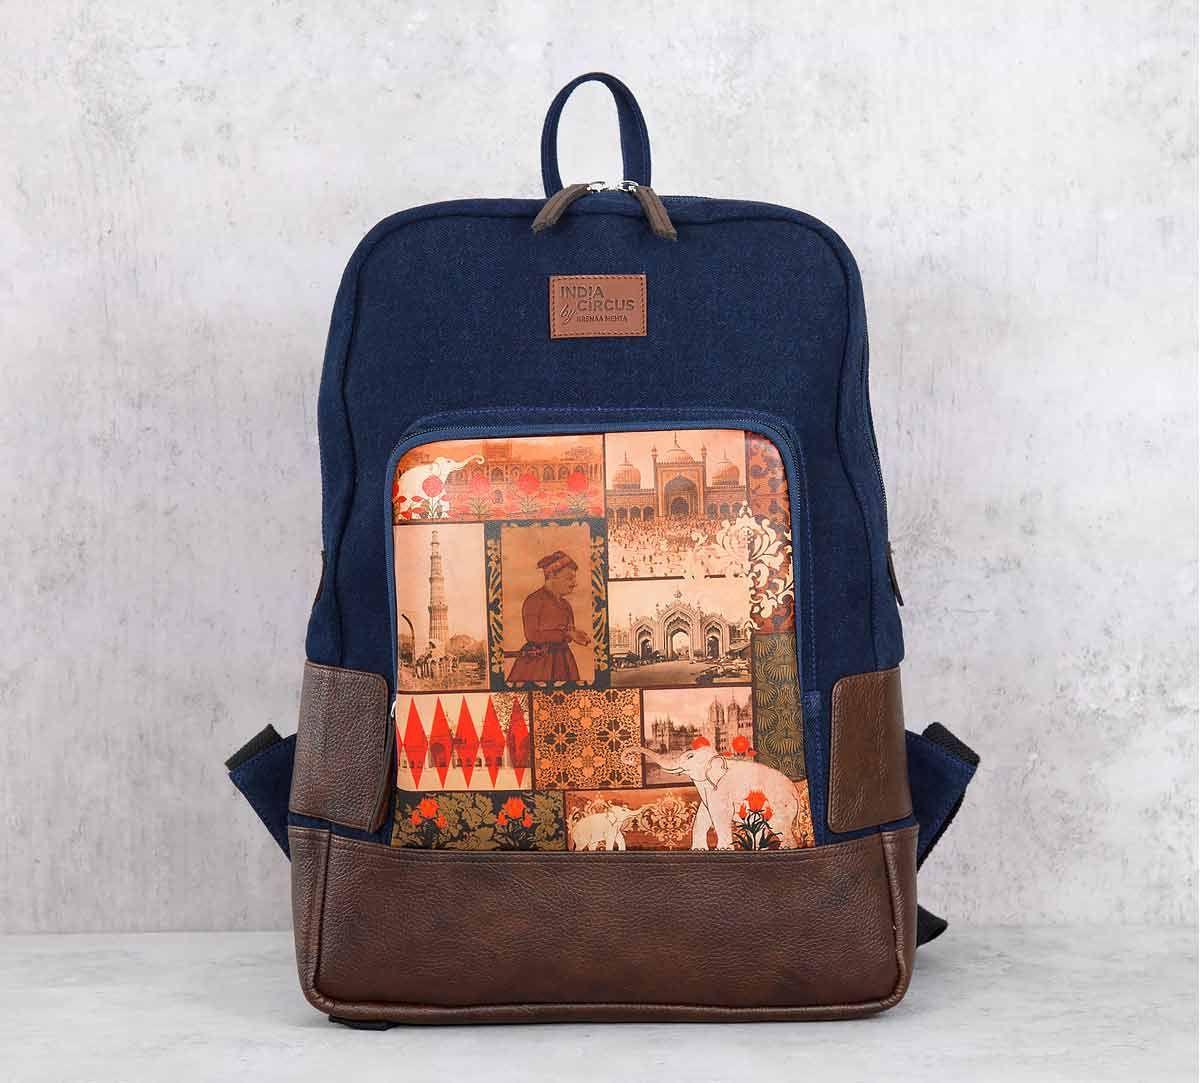 India Circus The Mughal Era Denim Backpack